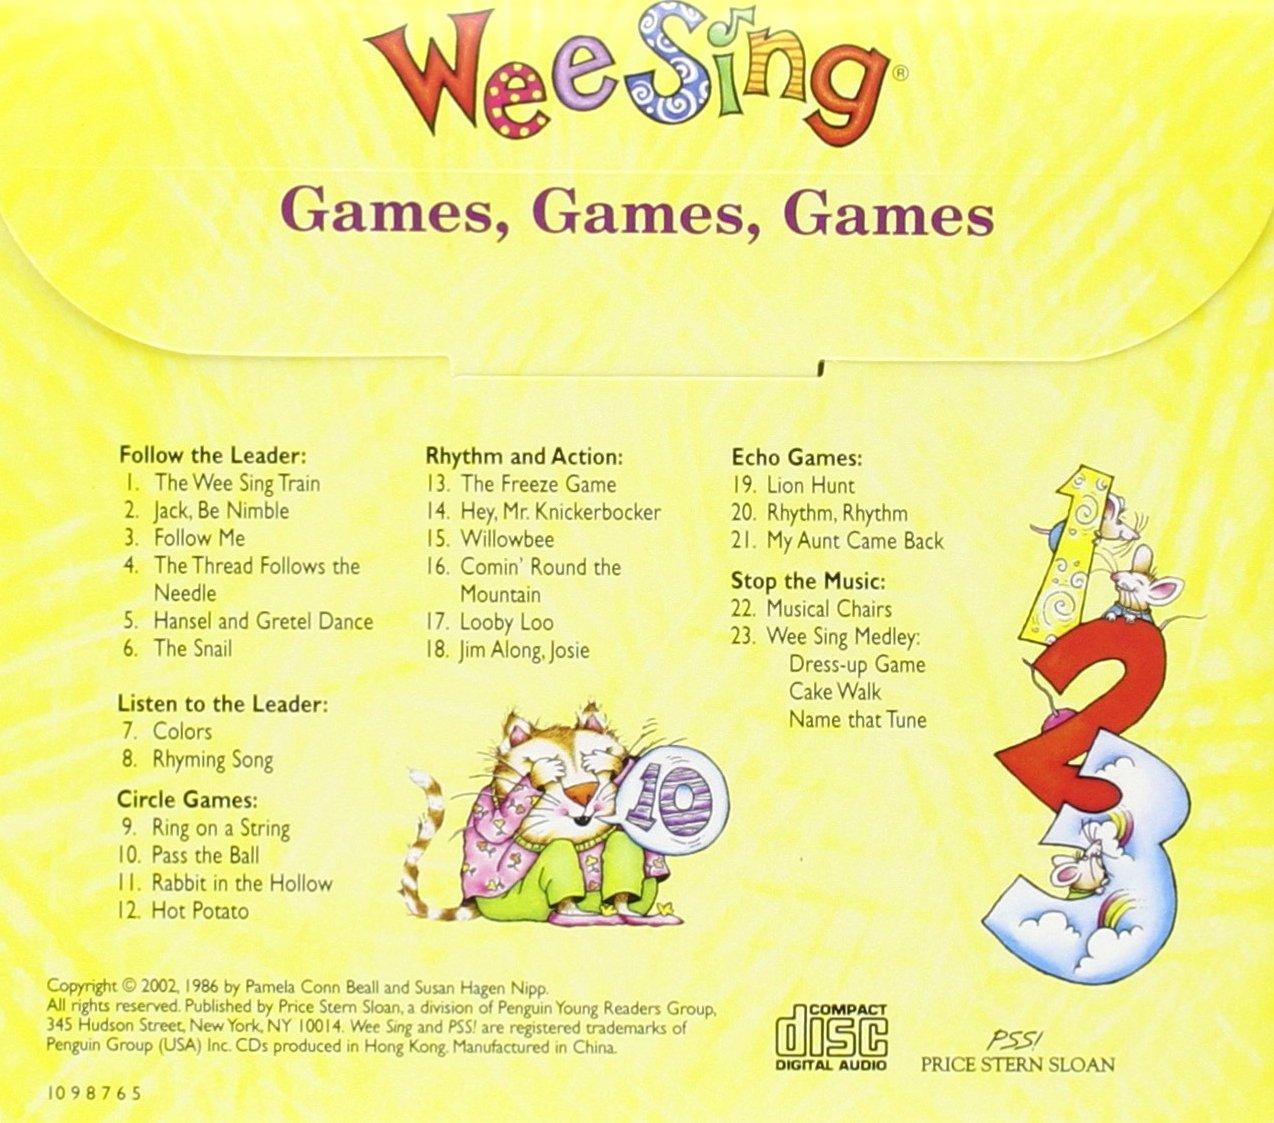 Amazon.com: Wee Sing Games, Games, Games (9780843120356): Pamela Conn Beall, Susan Hagen Nipp: Books